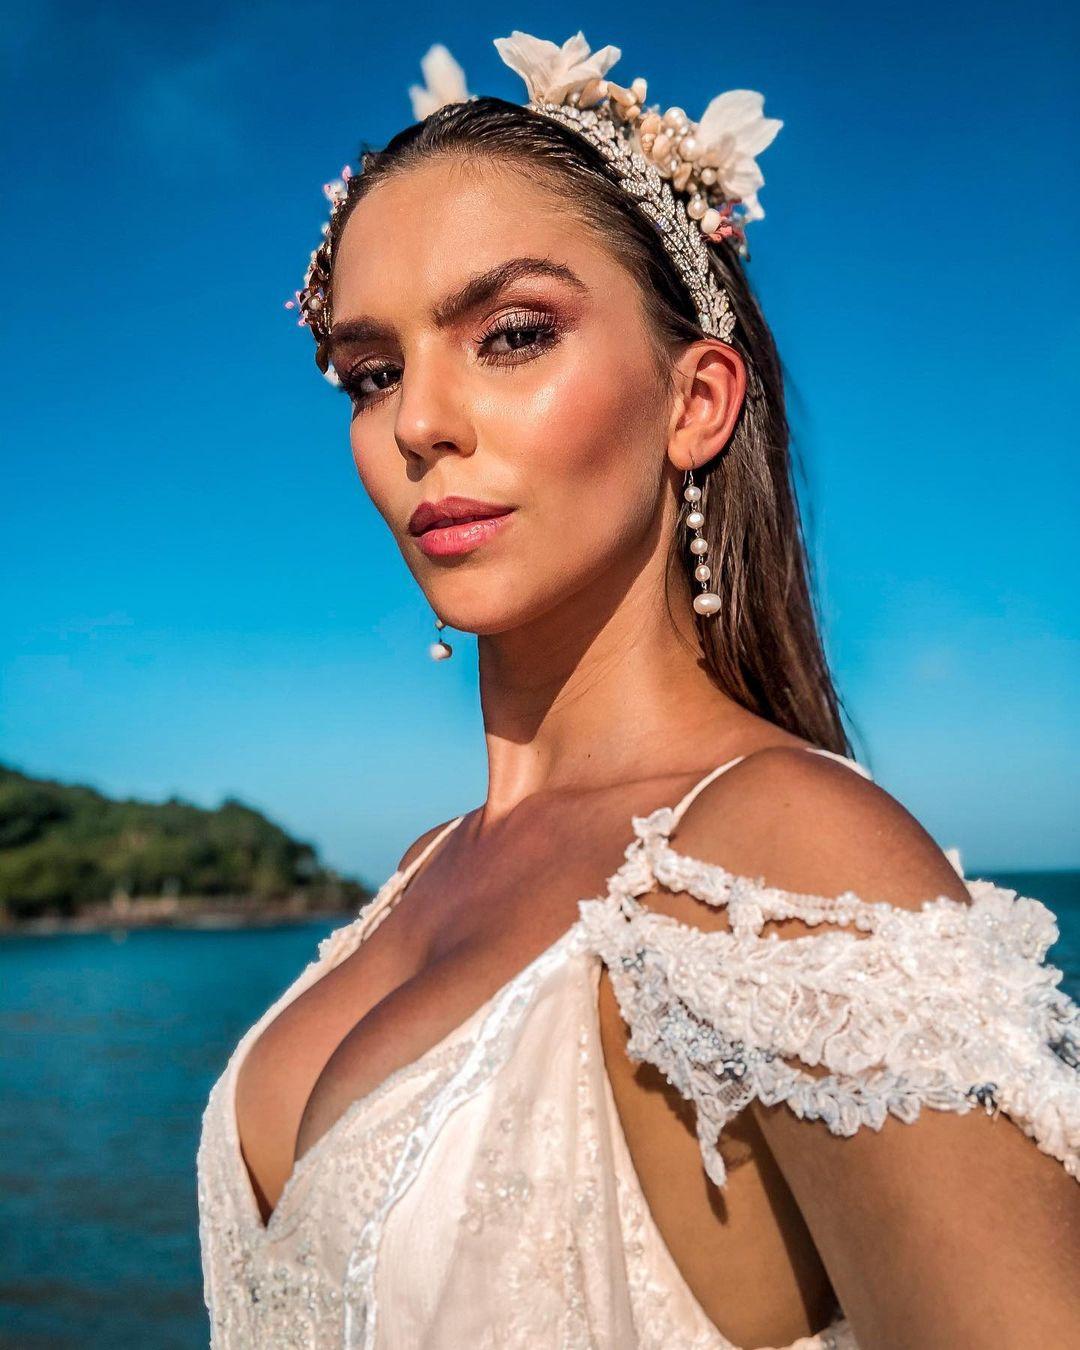 ana flavia giacomini, miss ilha dos lobos mundo 2019. Fvoue710